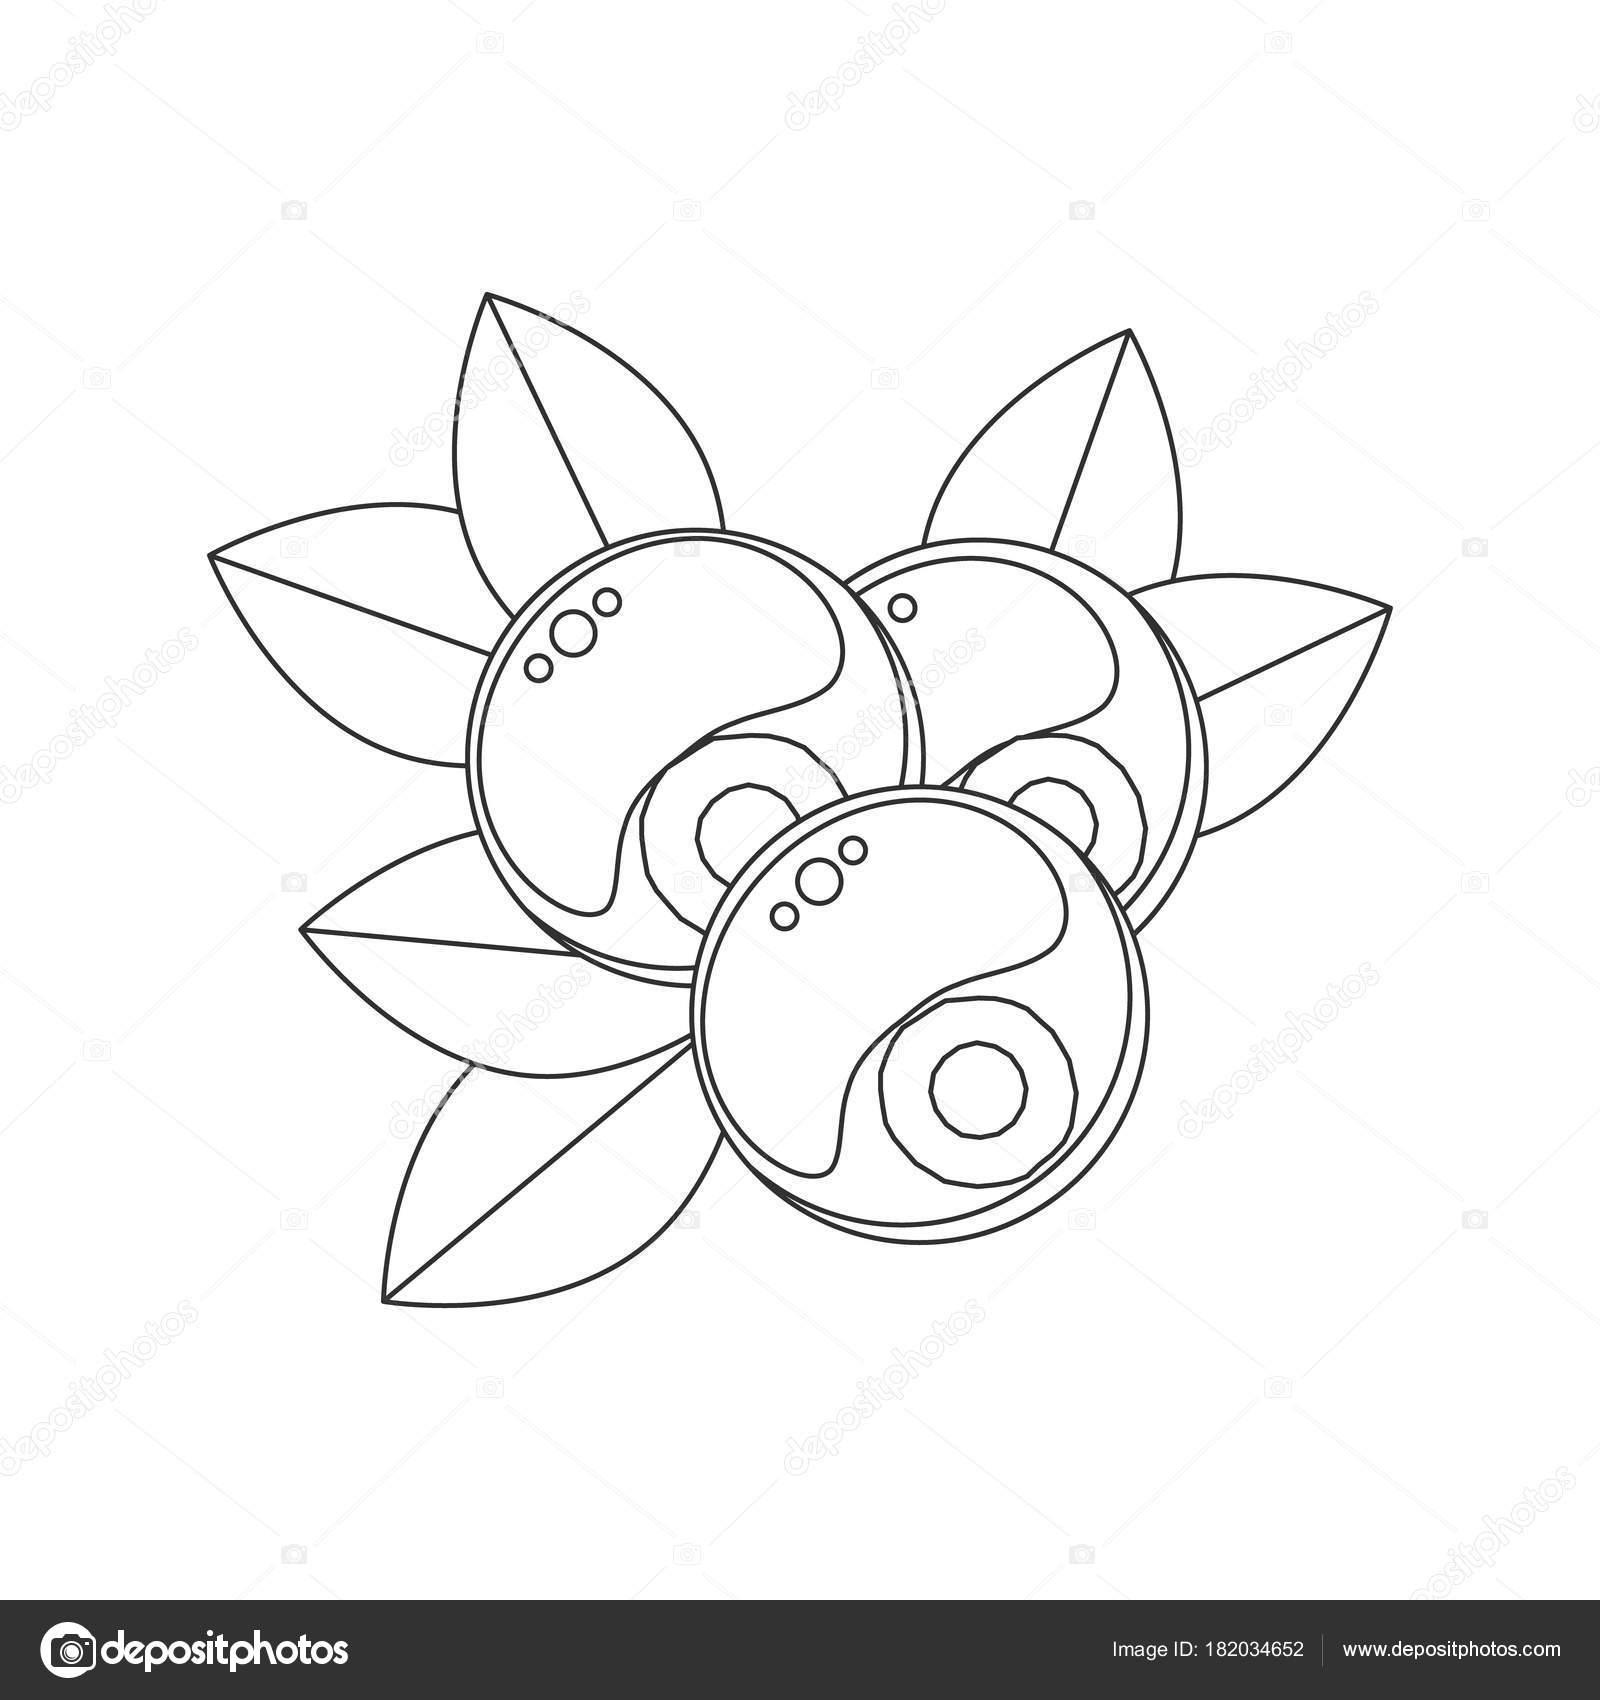 картинки голубика для детей раскраска для детей векторные